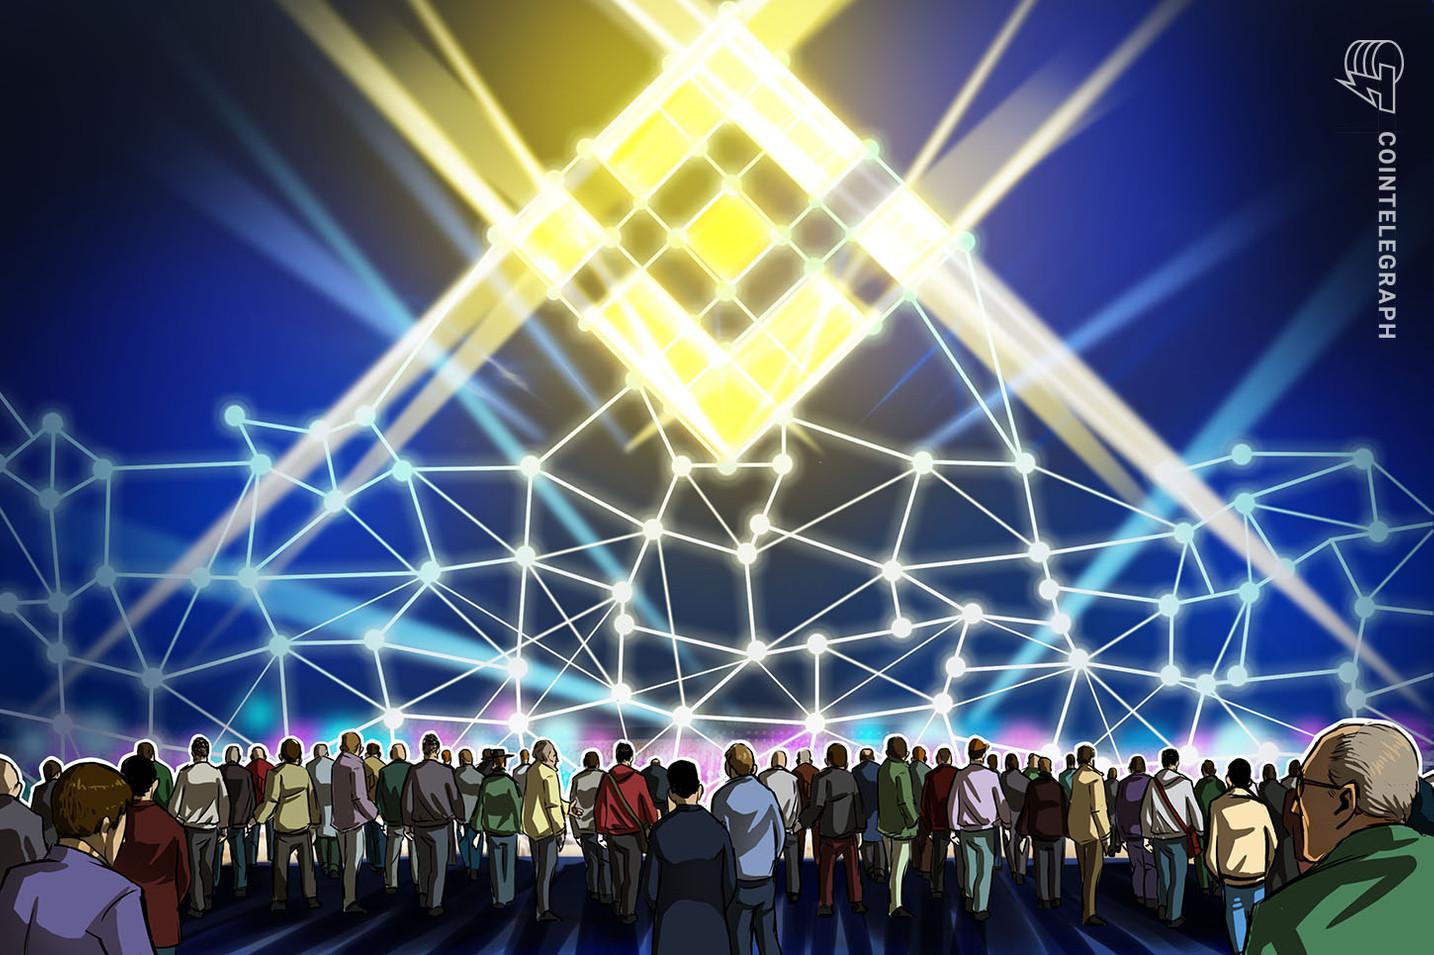 Messari researchers slam Binance Smart Chain over centralized validators